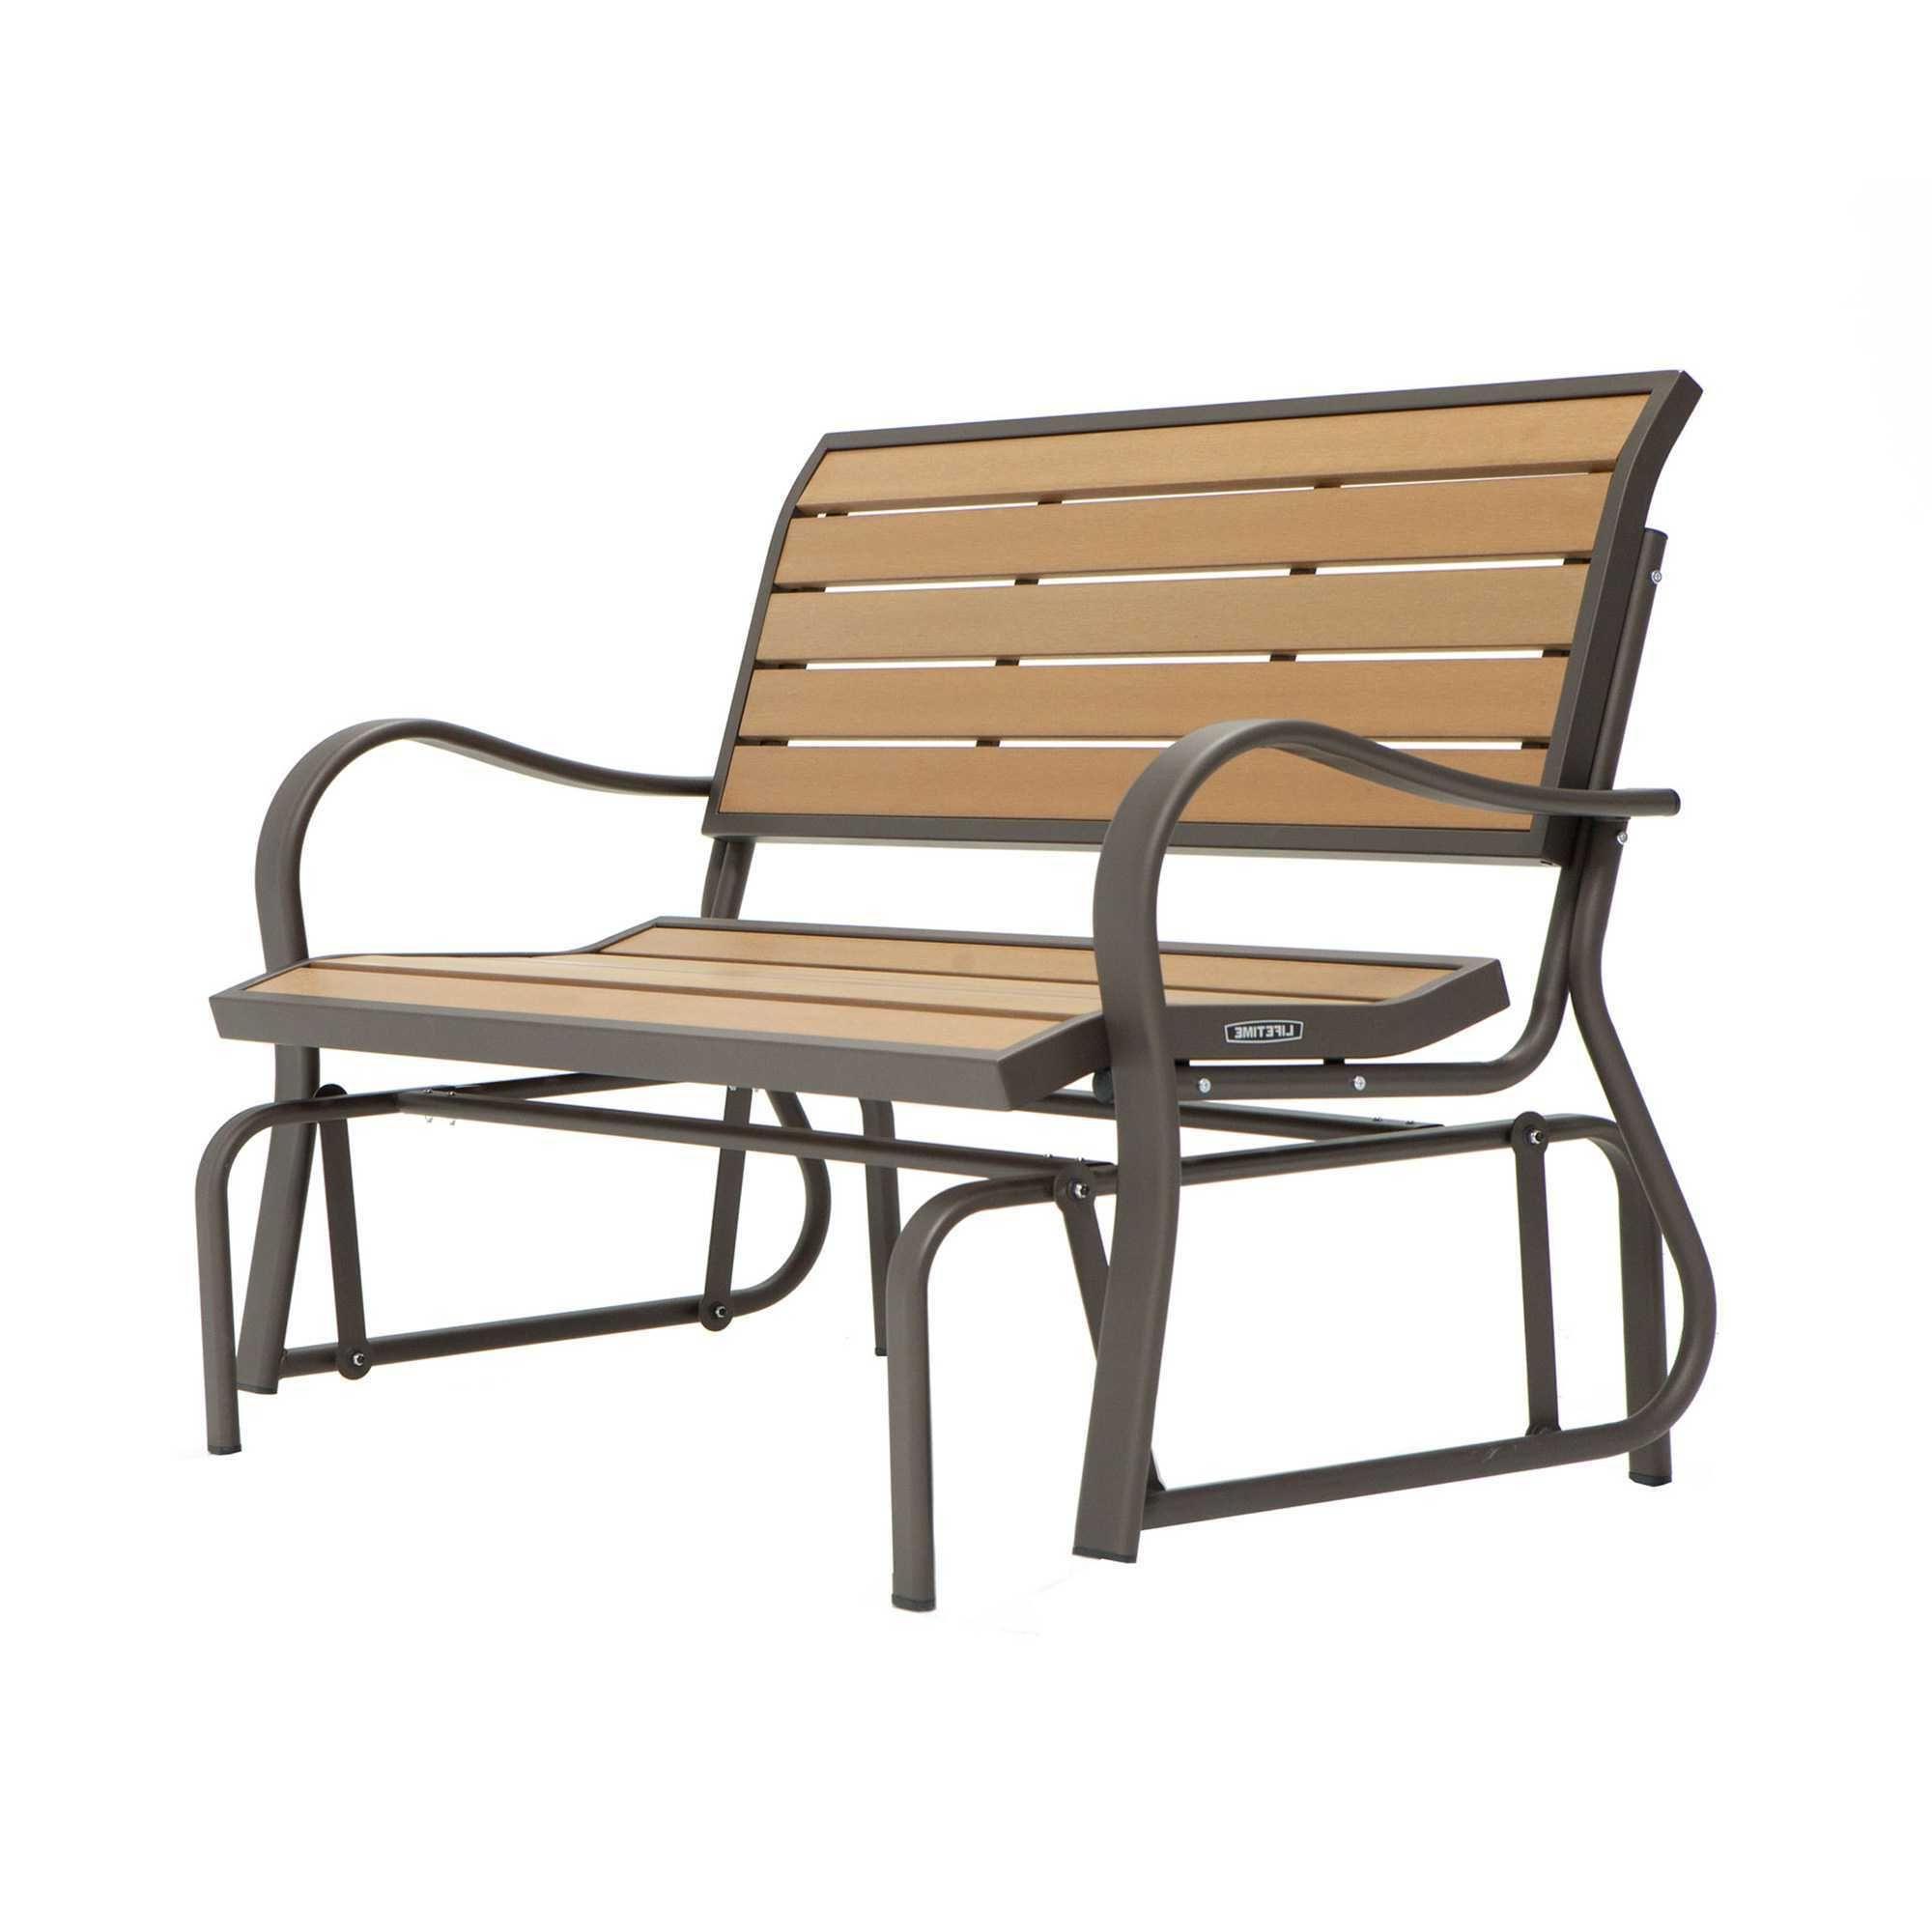 Lifetime Plastic/steel Glider Bench (Wood Alternative Regarding Recent Outdoor Patio Swing Porch Rocker Glider Benches Loveseat Garden Seat Steel (View 14 of 25)